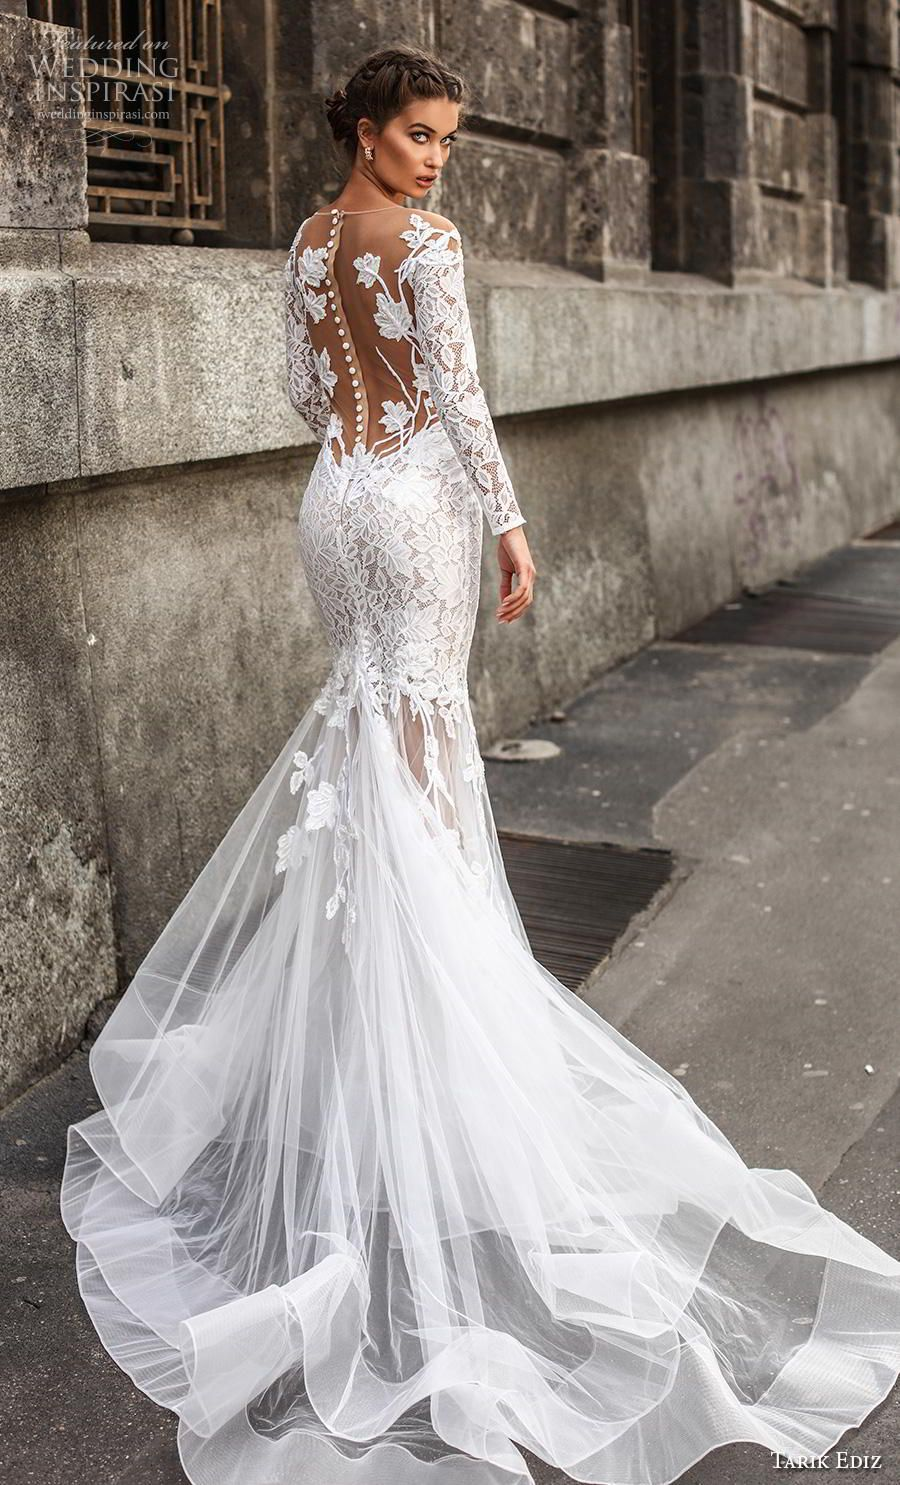 Tarik Ediz 2019 Wedding Dresses White Bridal Collection Wedding Inspirasi Glamourous Wedding Dress Wedding Dresses Bridal Dresses [ 1485 x 900 Pixel ]